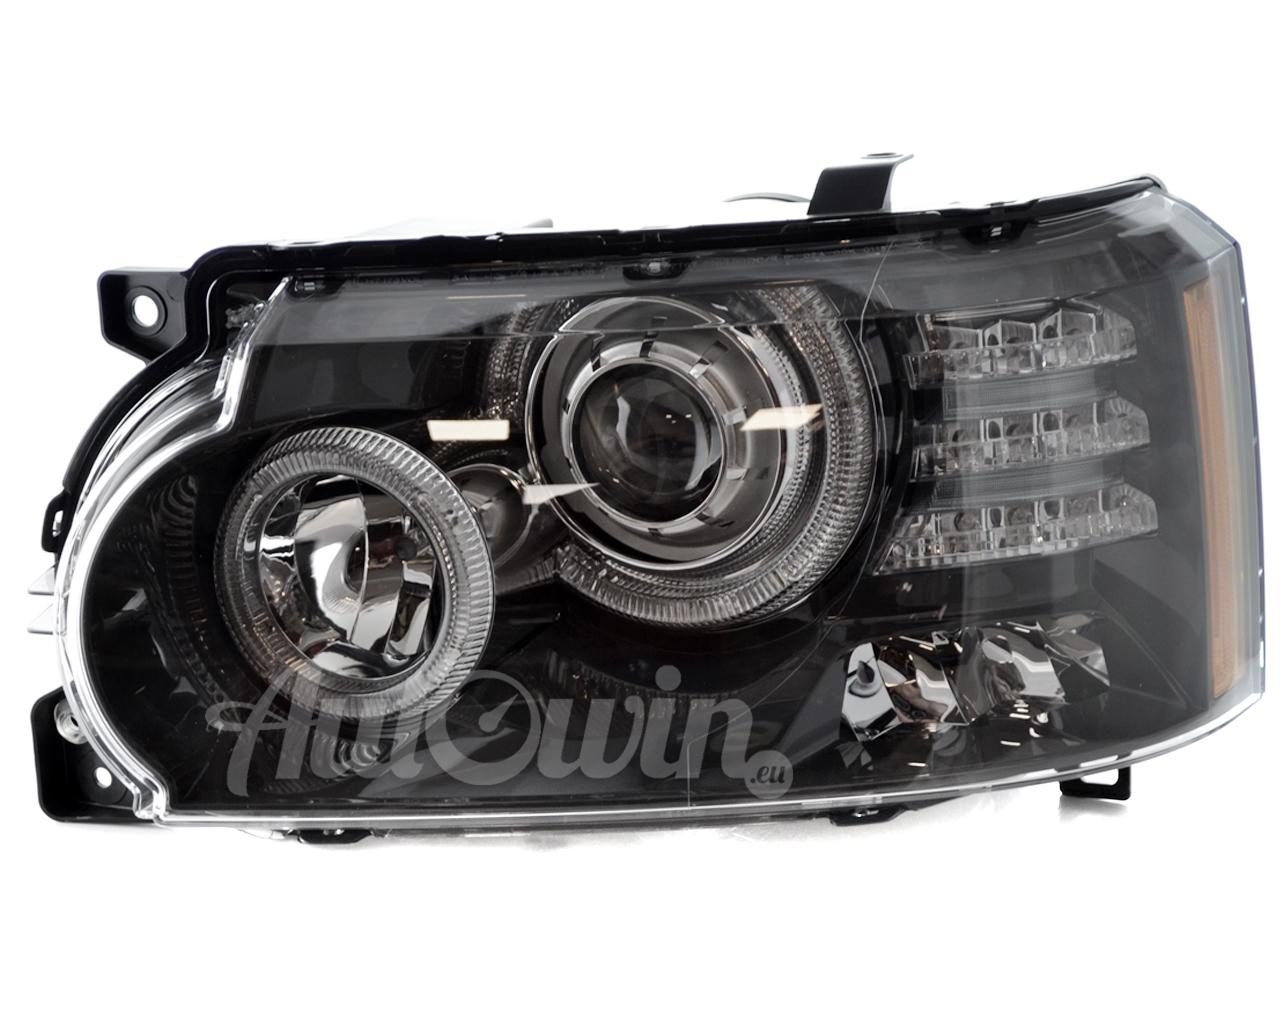 range rover l322 xenon adaptive assembly headlight left. Black Bedroom Furniture Sets. Home Design Ideas